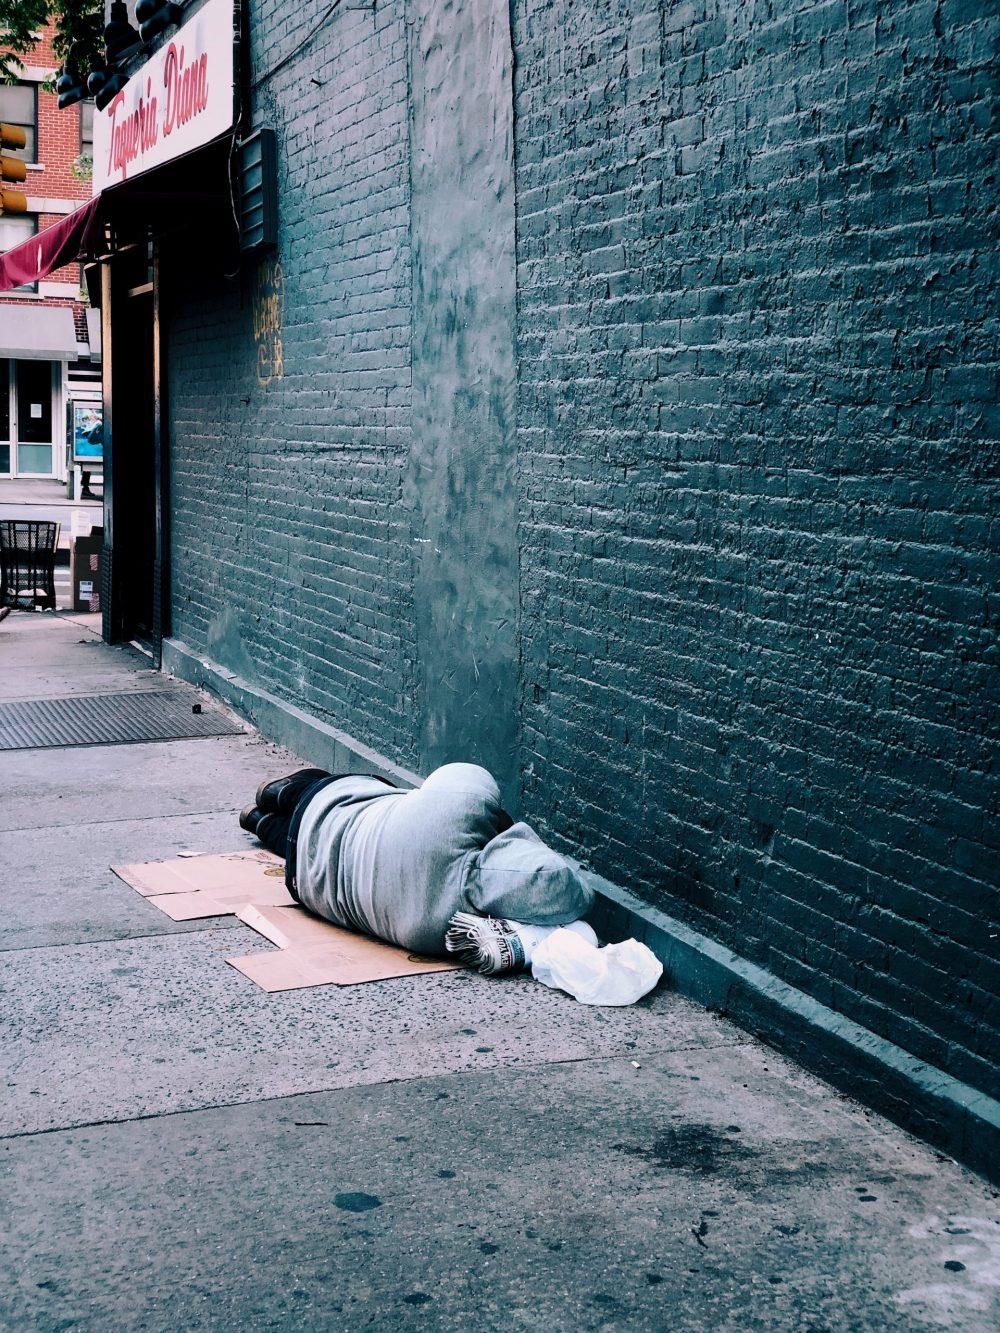 homeless person on box| Politics News Scotland